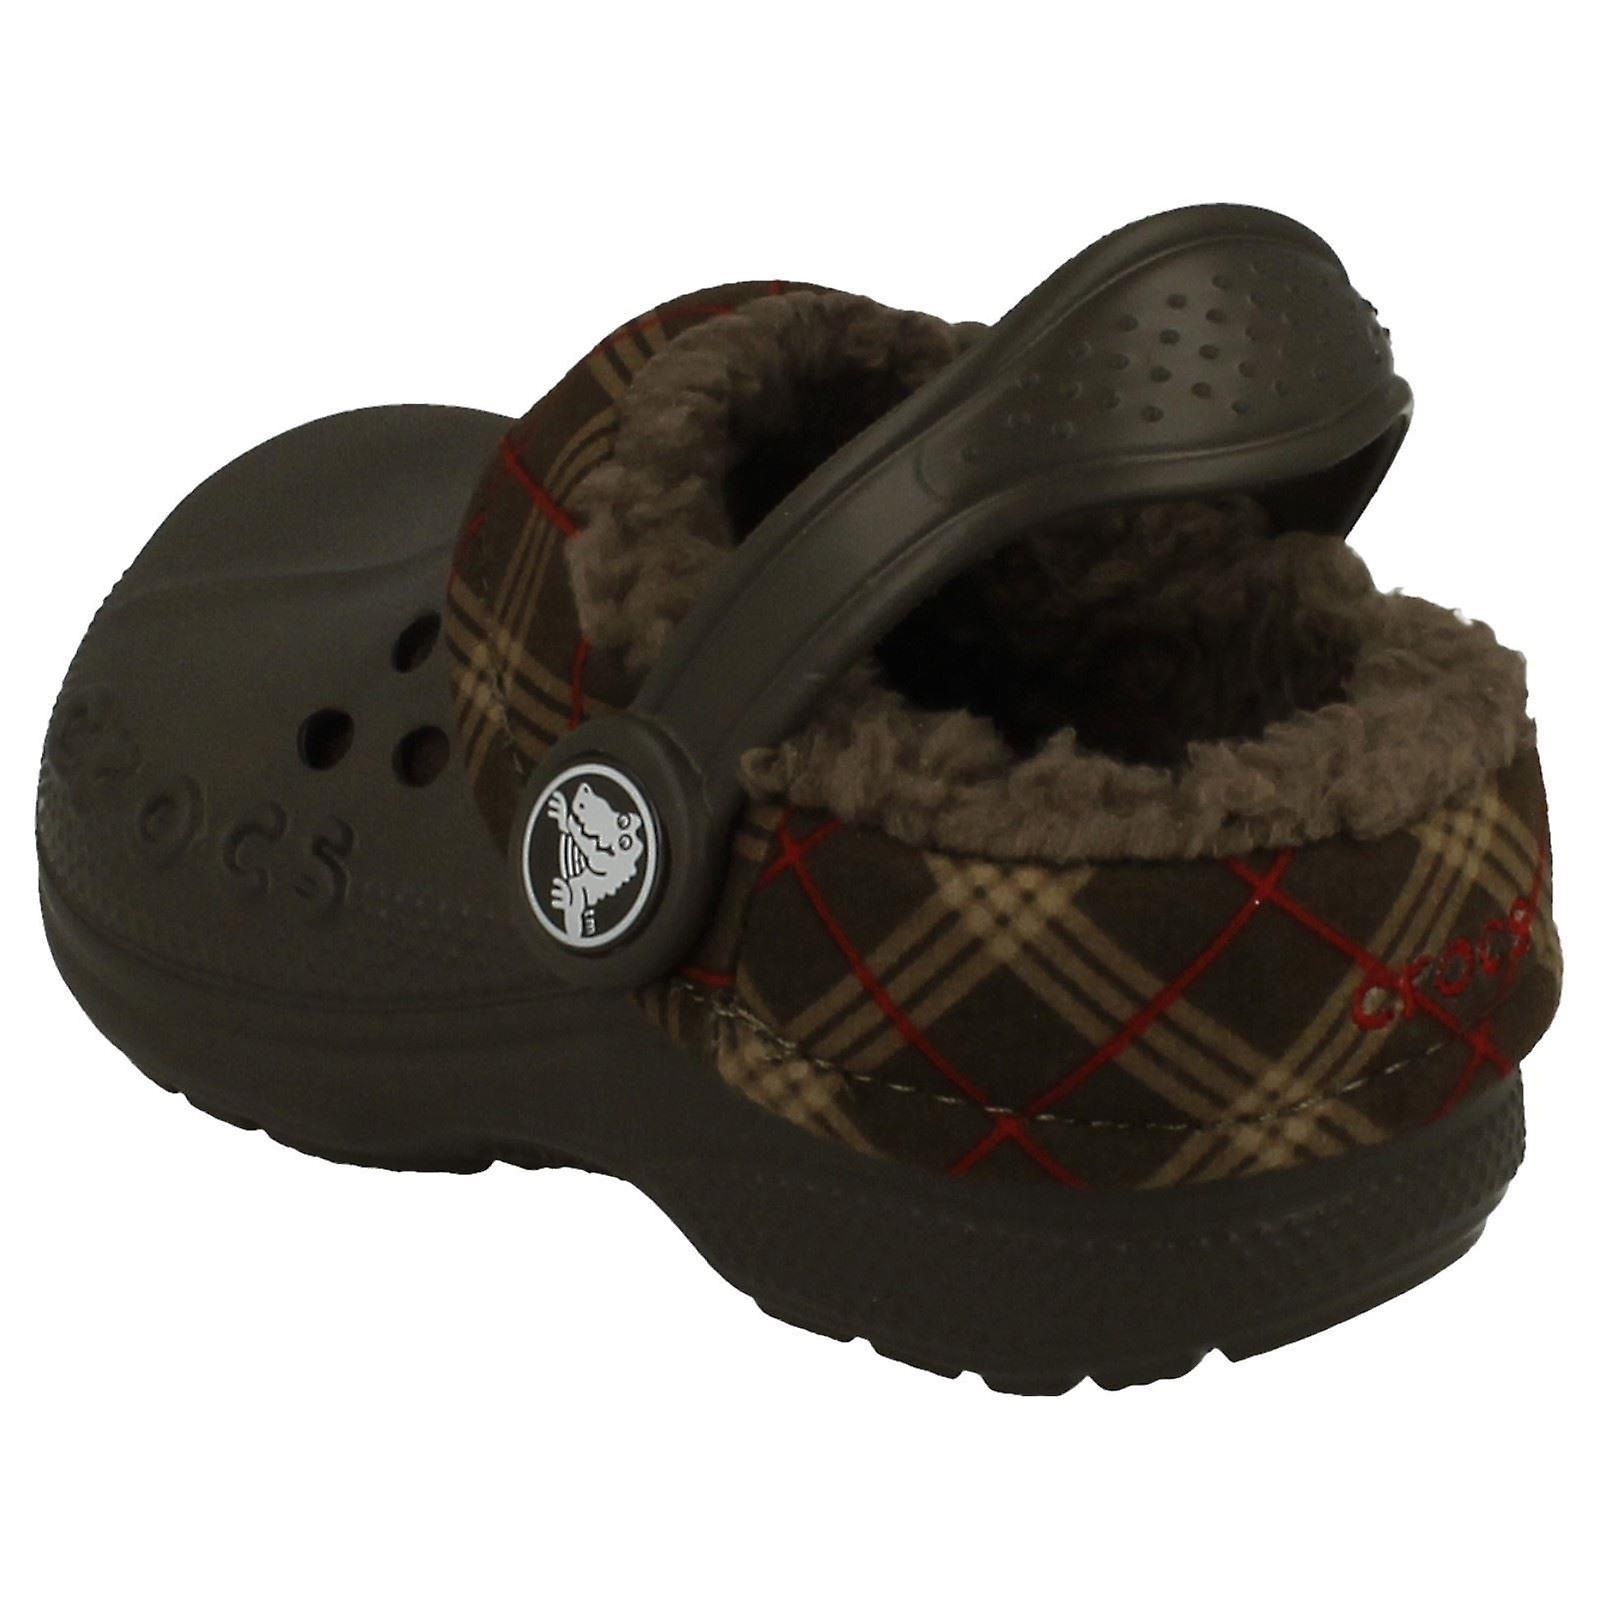 Jongens Crocs Blitzen Winter Plaid Kids g2fm6Y